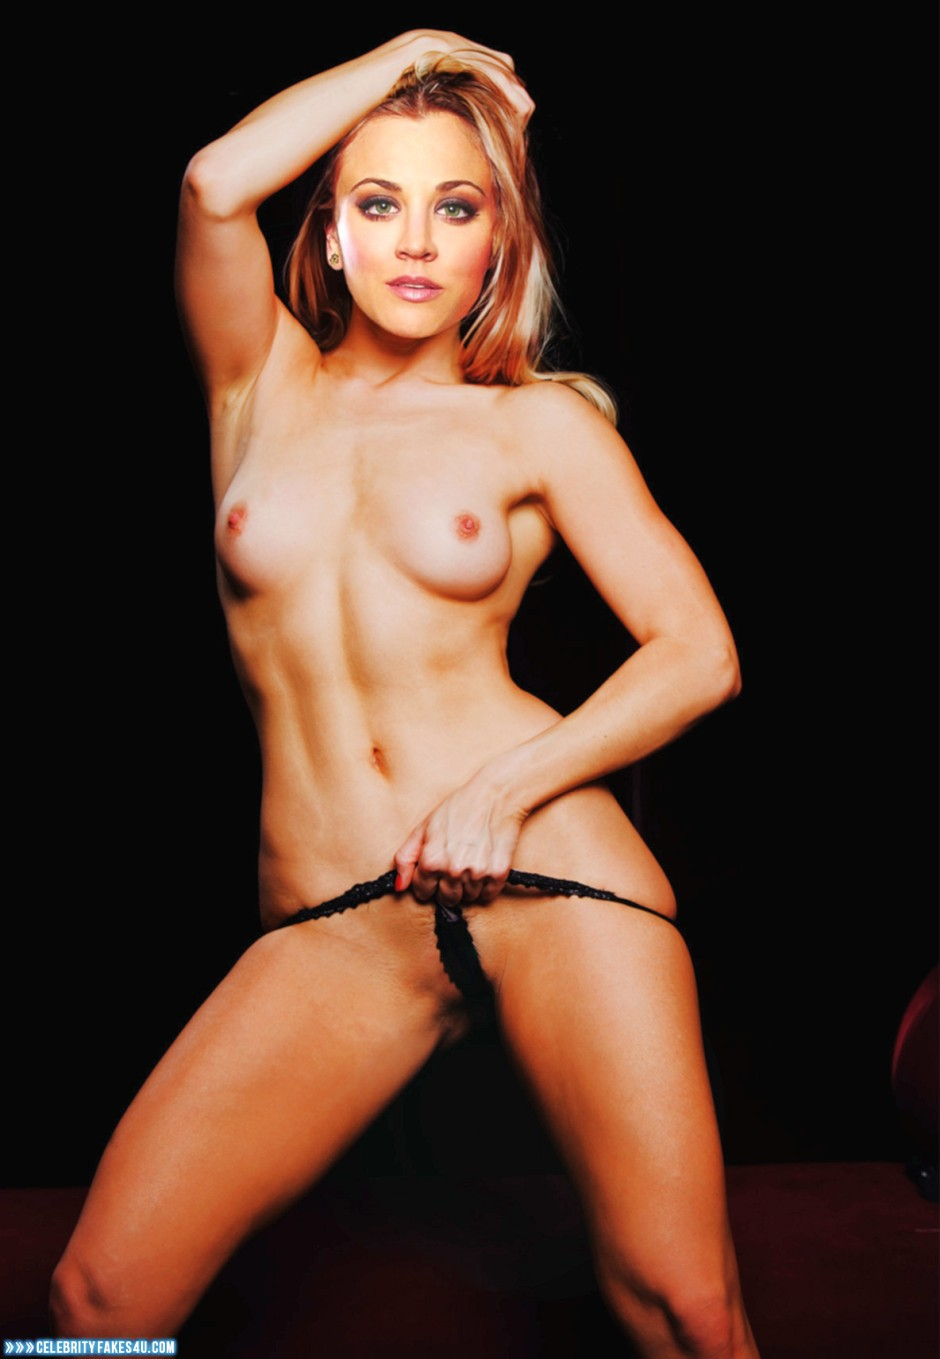 Mandy mistery nackt